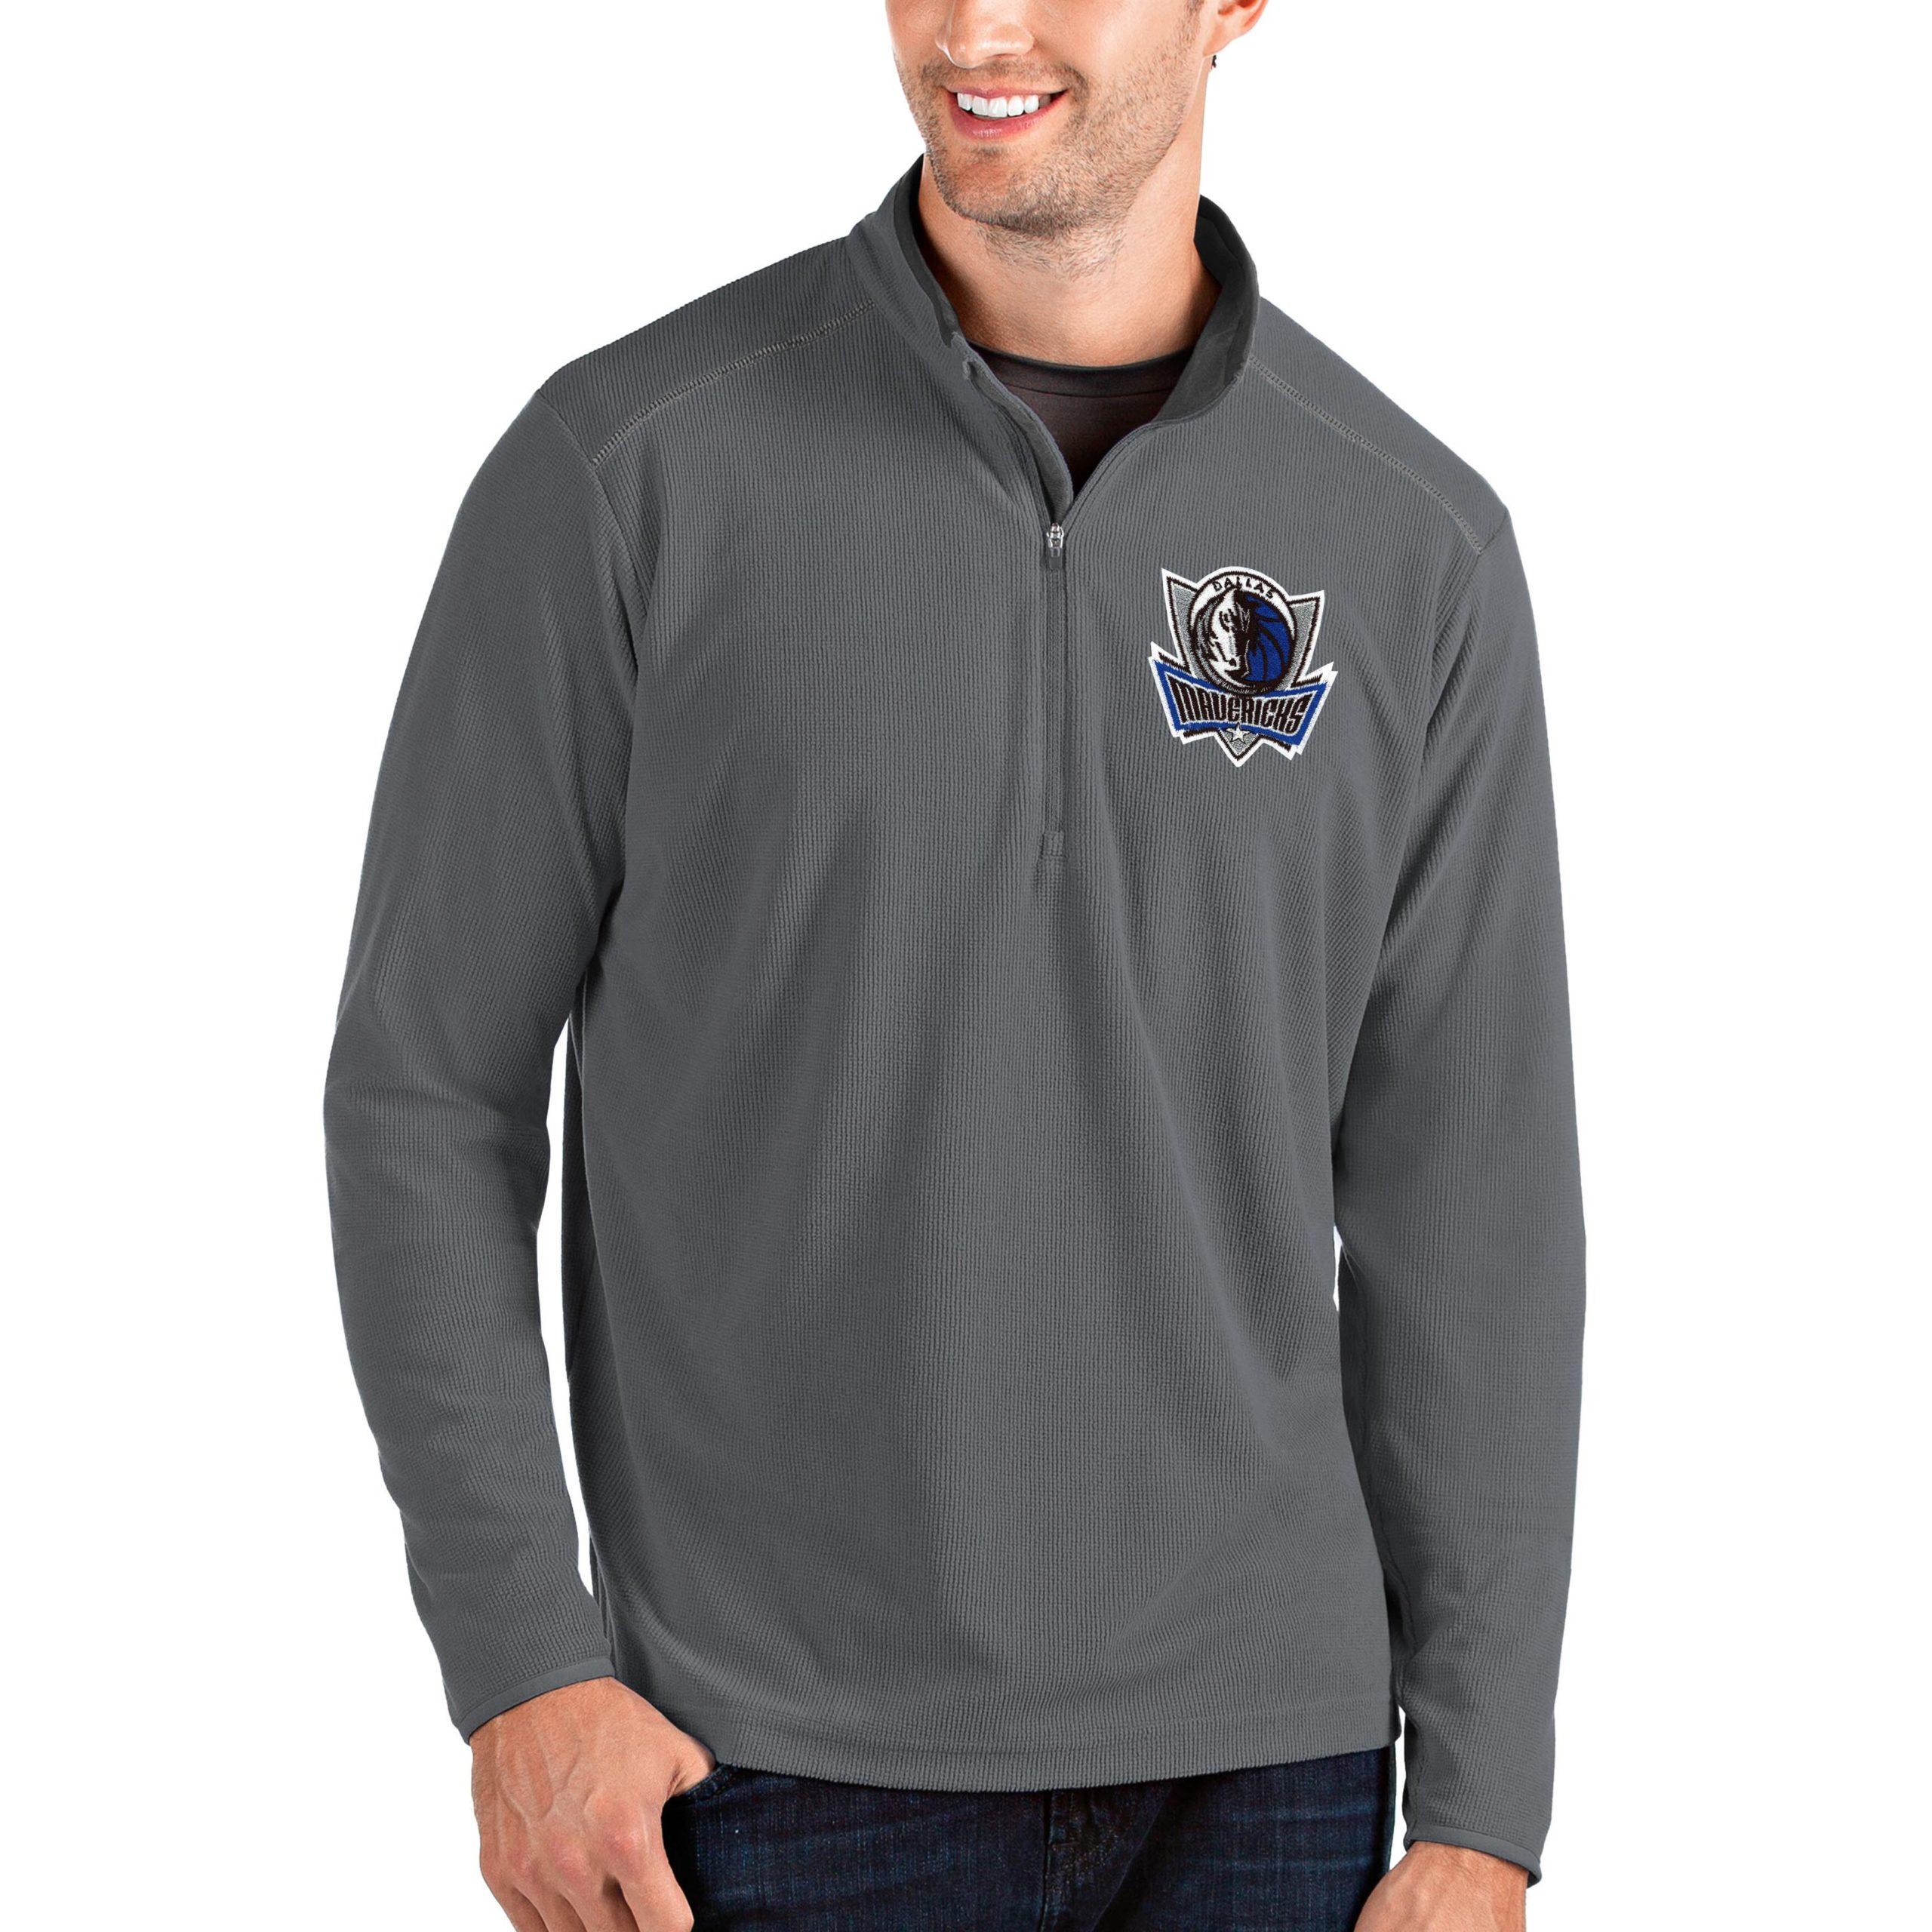 Dallas Mavericks Antigua Big & Tall Glacier Quarter-Zip Pullover Jacket - Gray/Gray